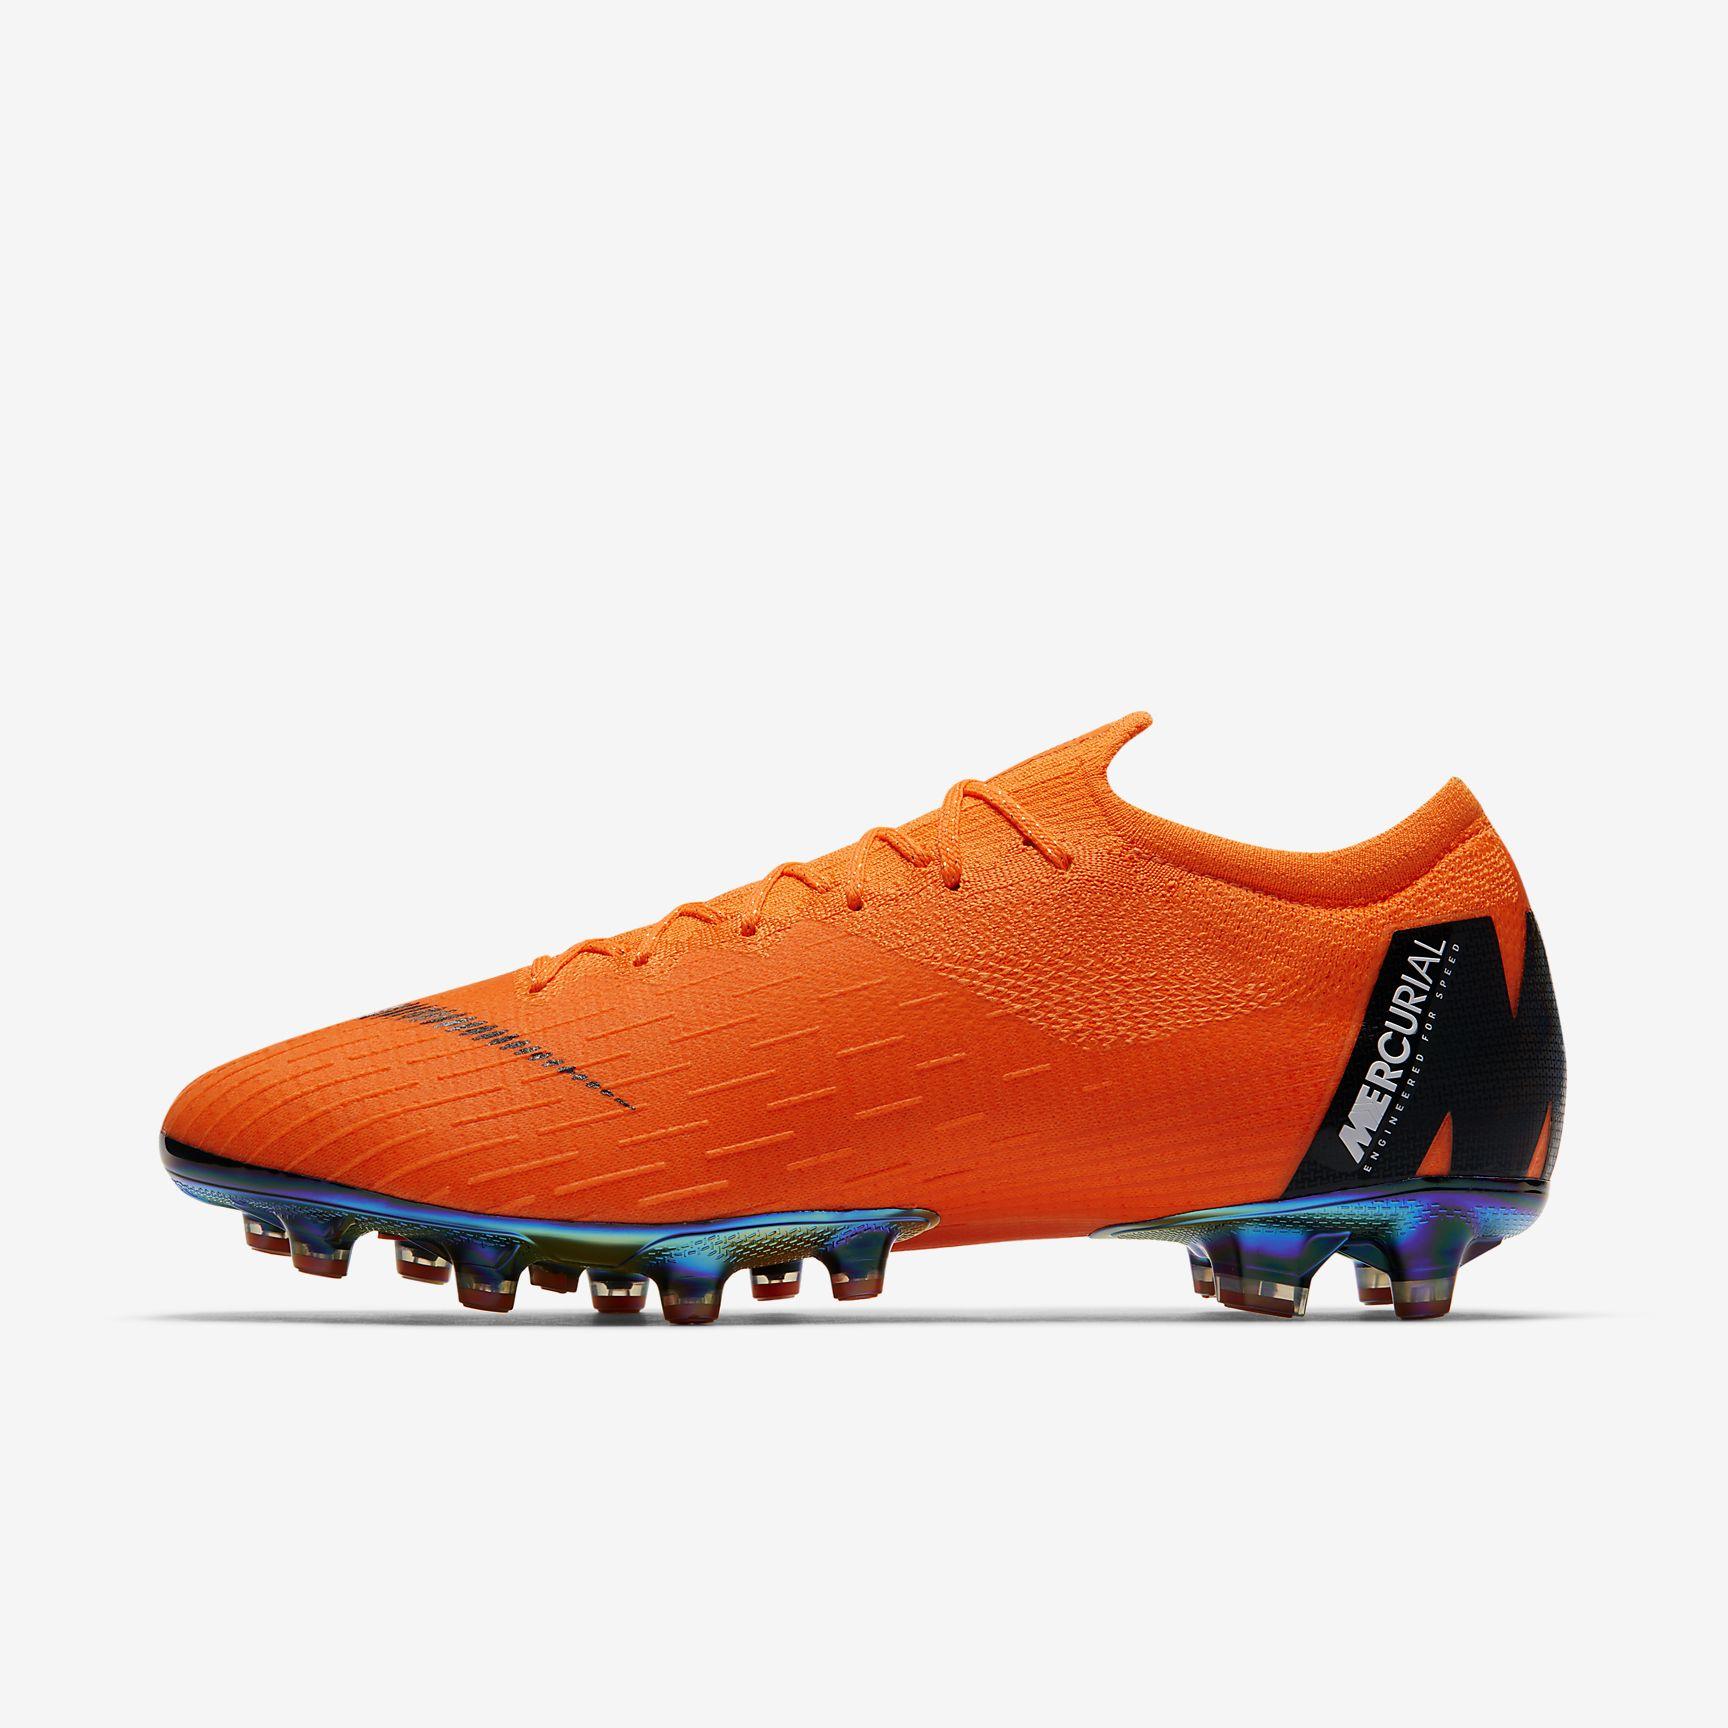 chaussures-football-Nike-Mercurial-Vapor-XII-Elite-img1